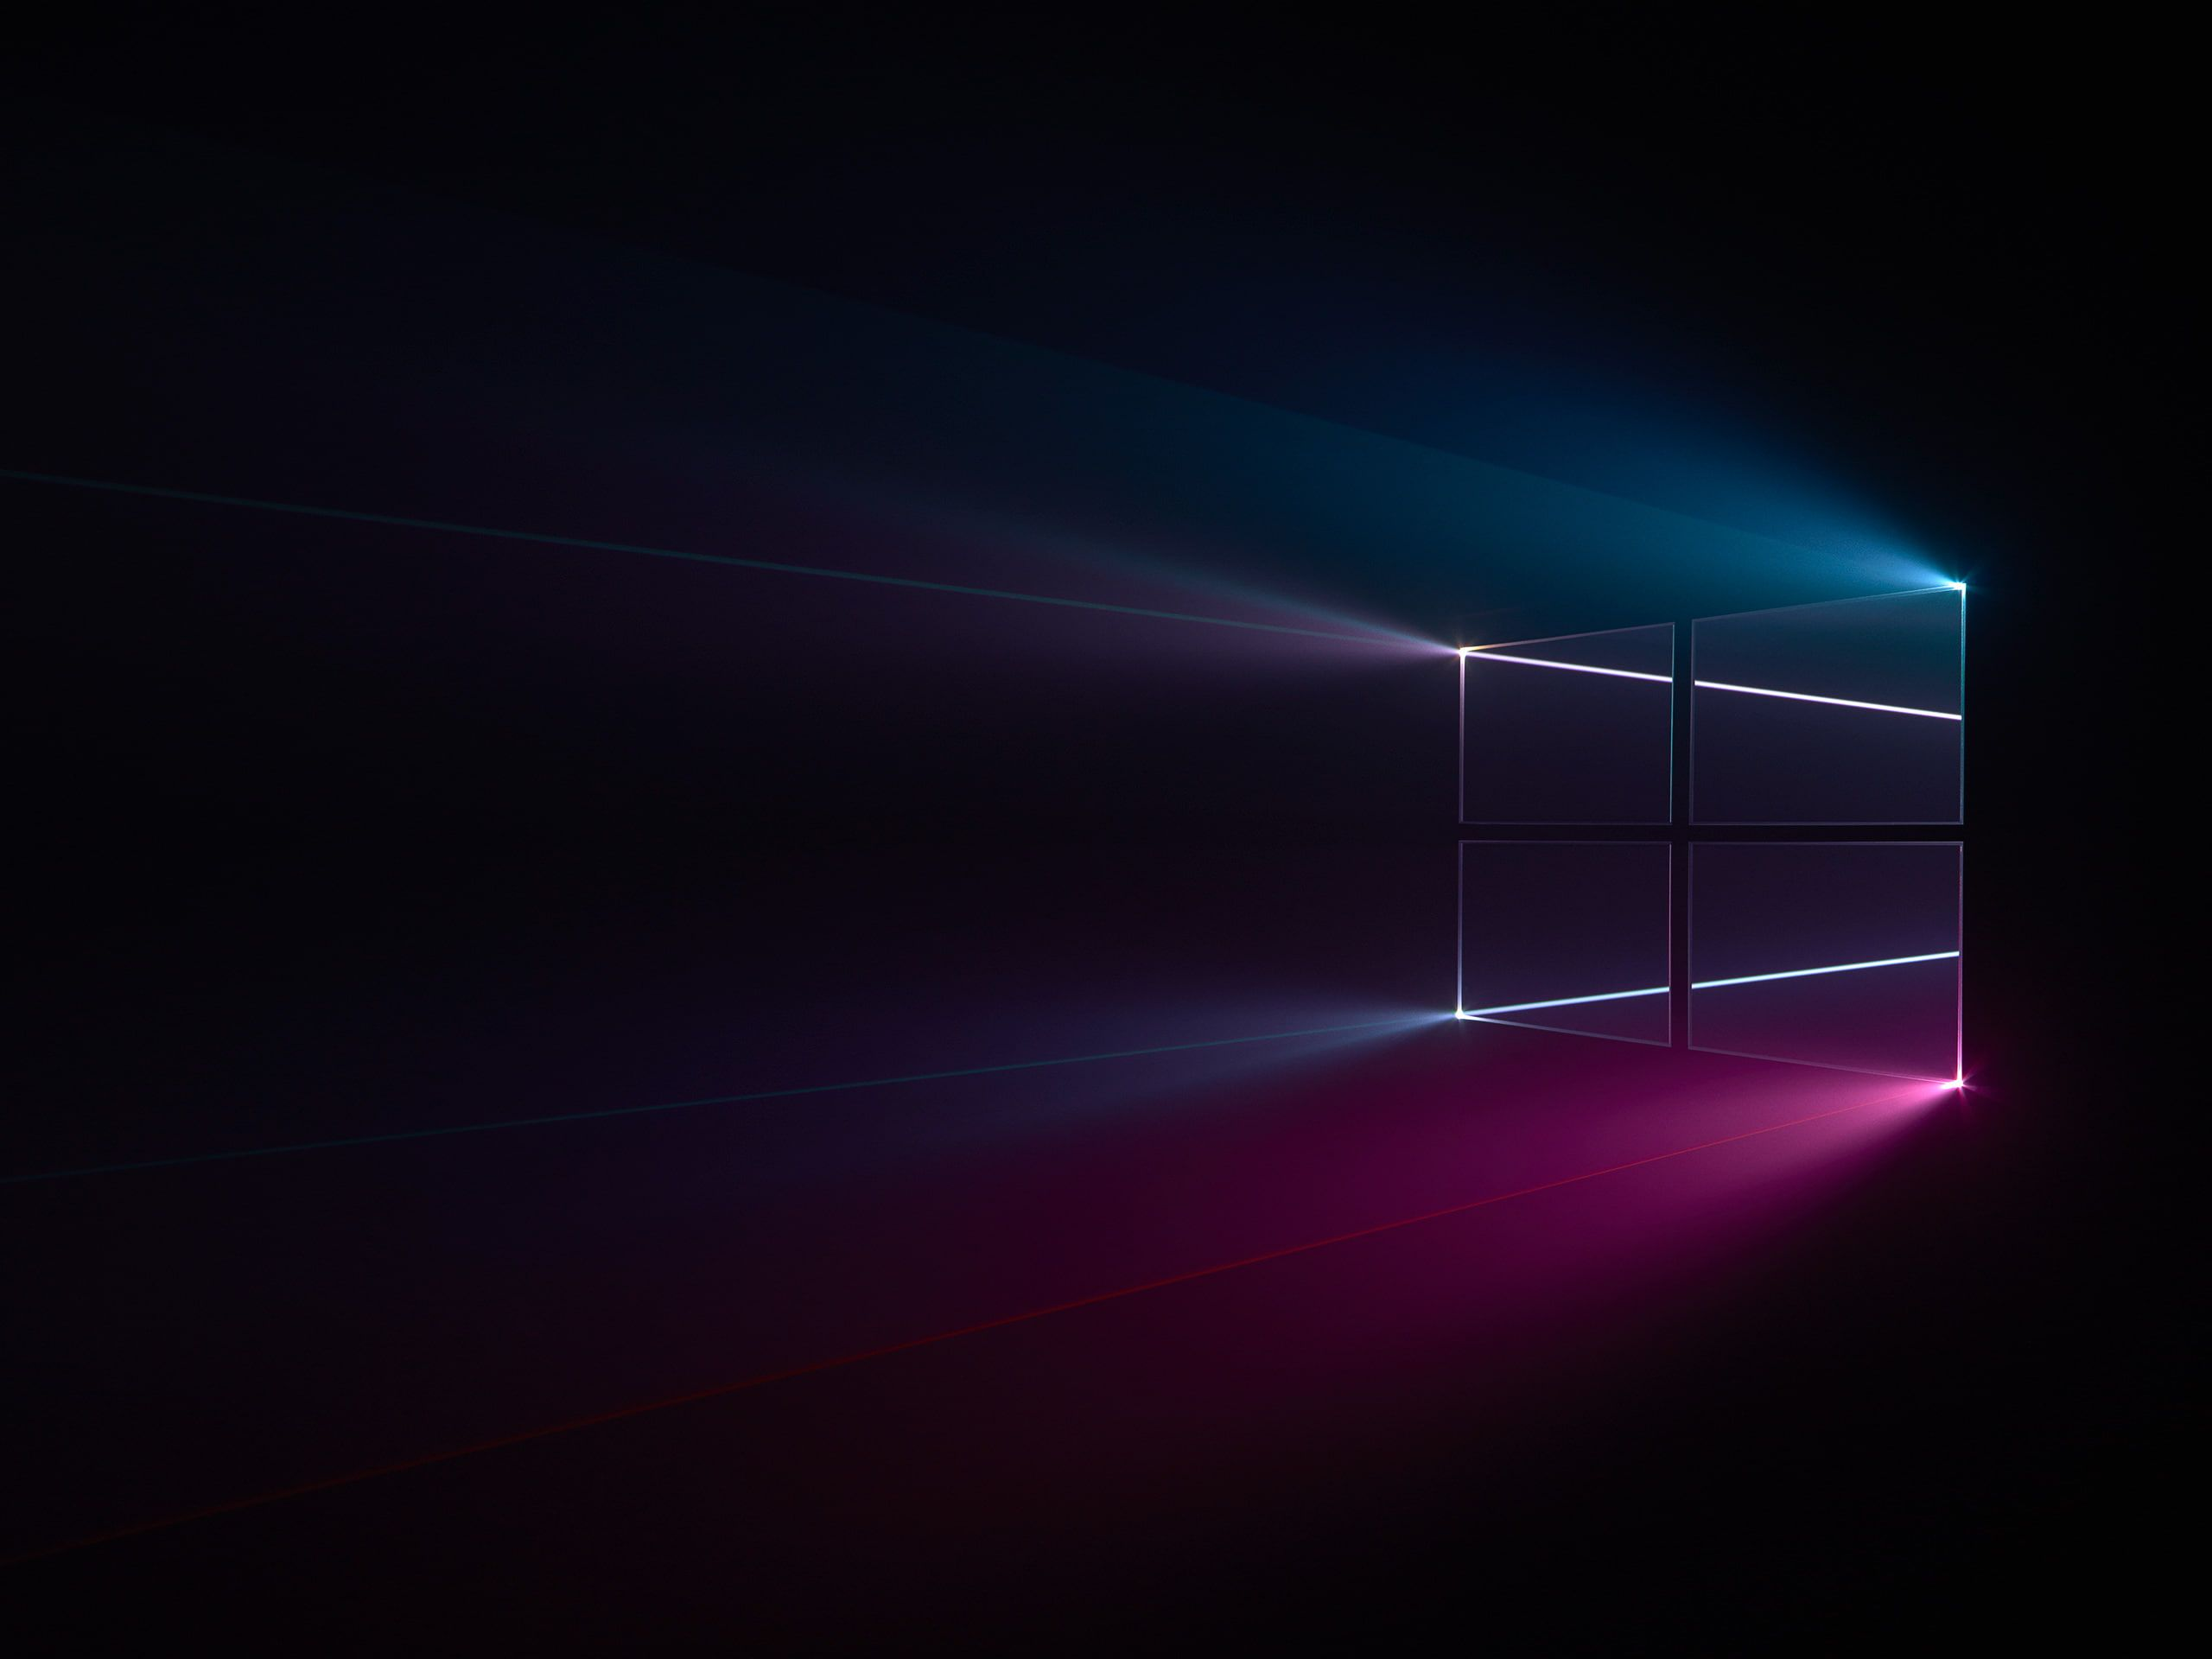 Desktop Background Black Windows 10